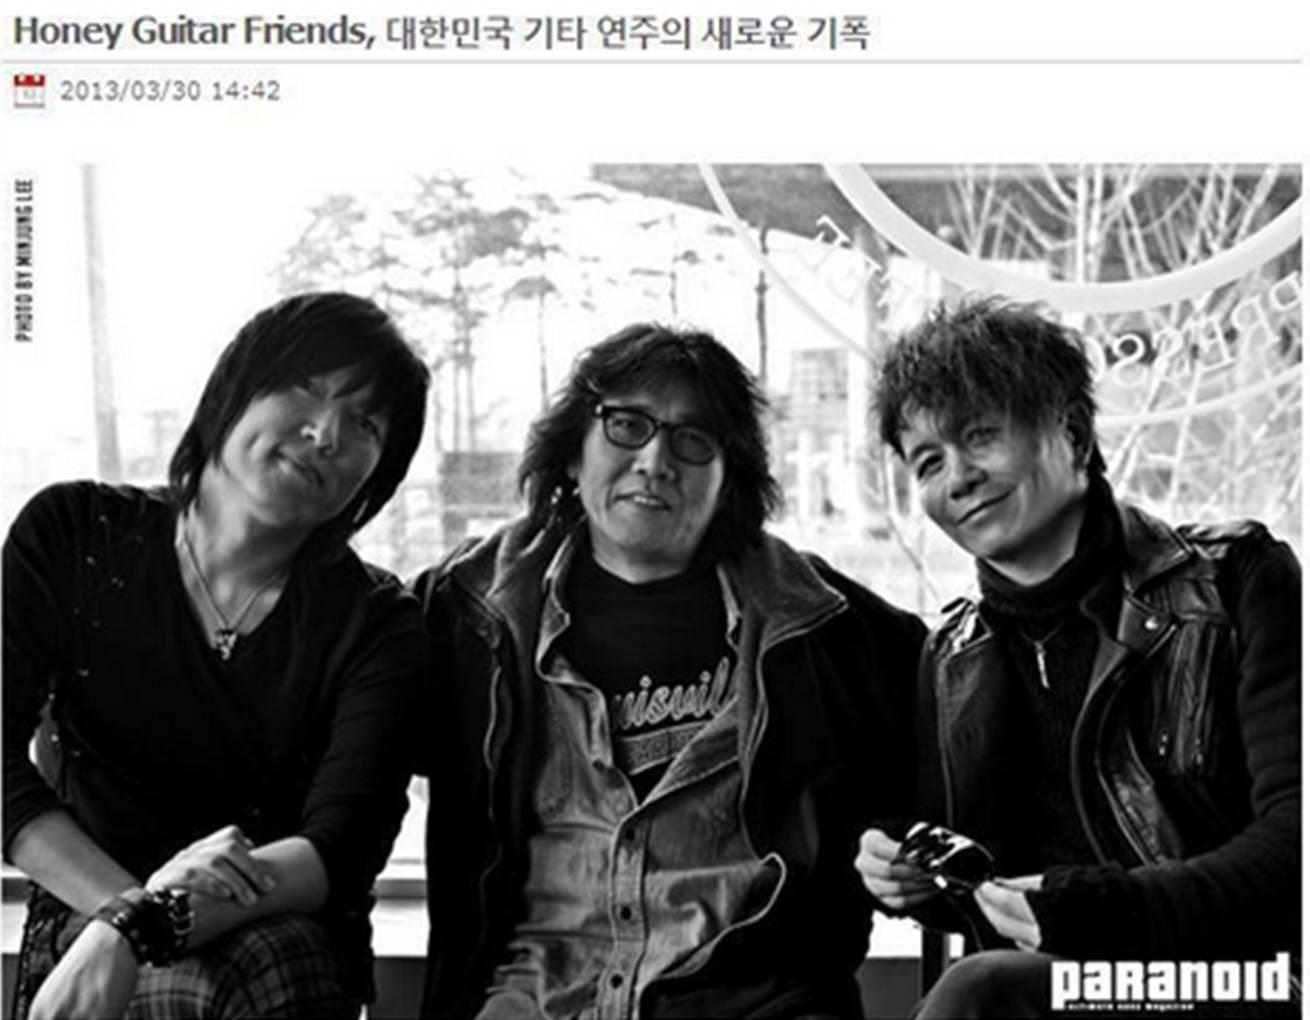 [Review] Honeyguitar Friends Concert -..